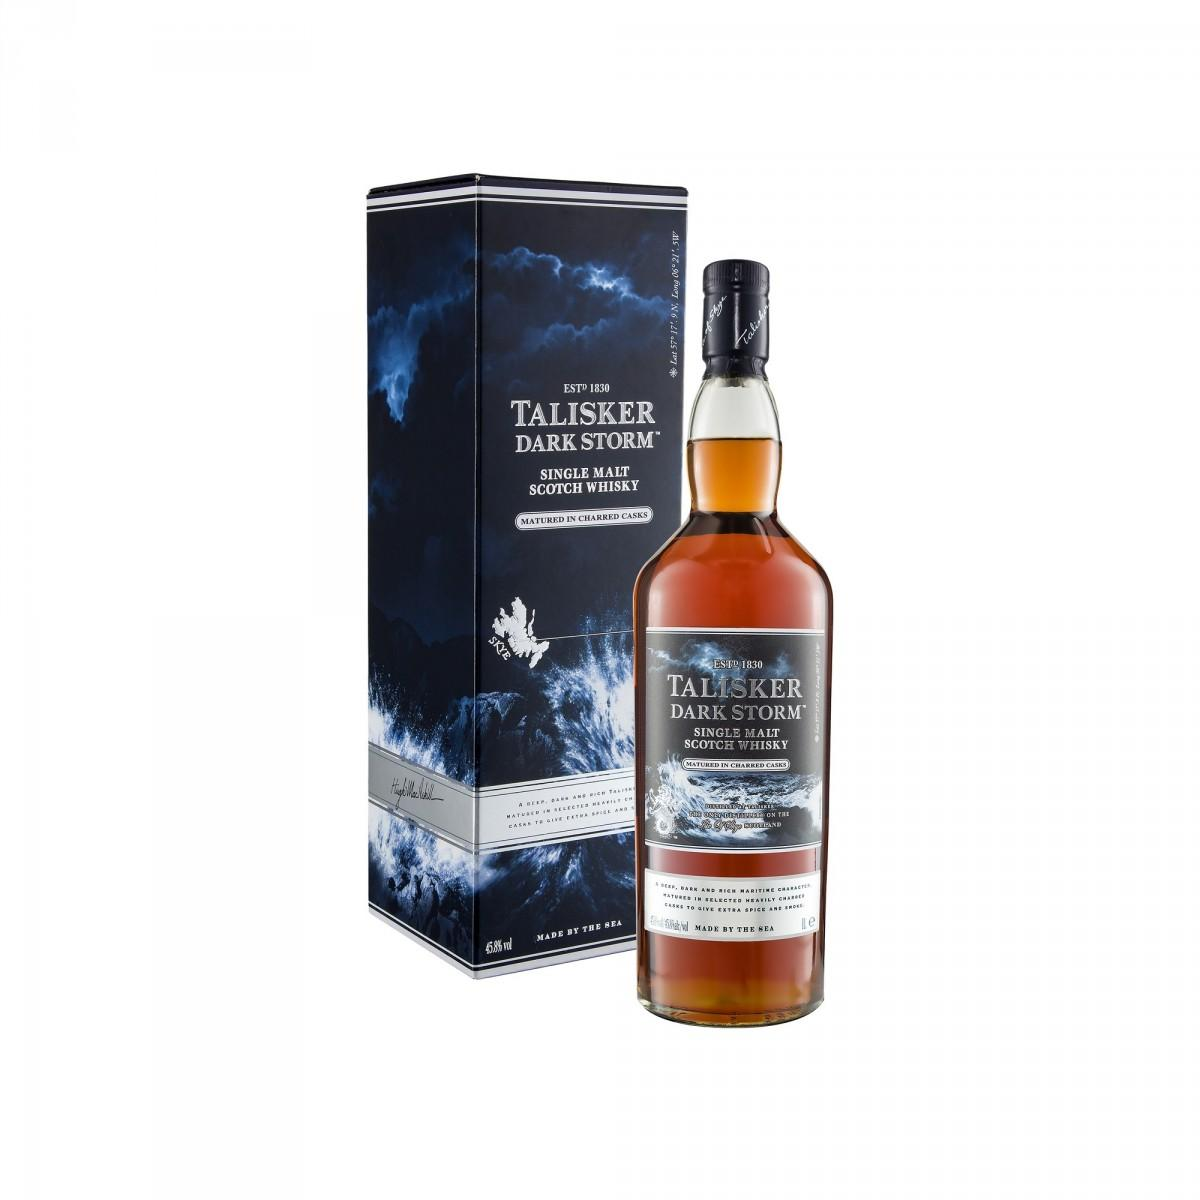 whiskies spirits aelia duty free